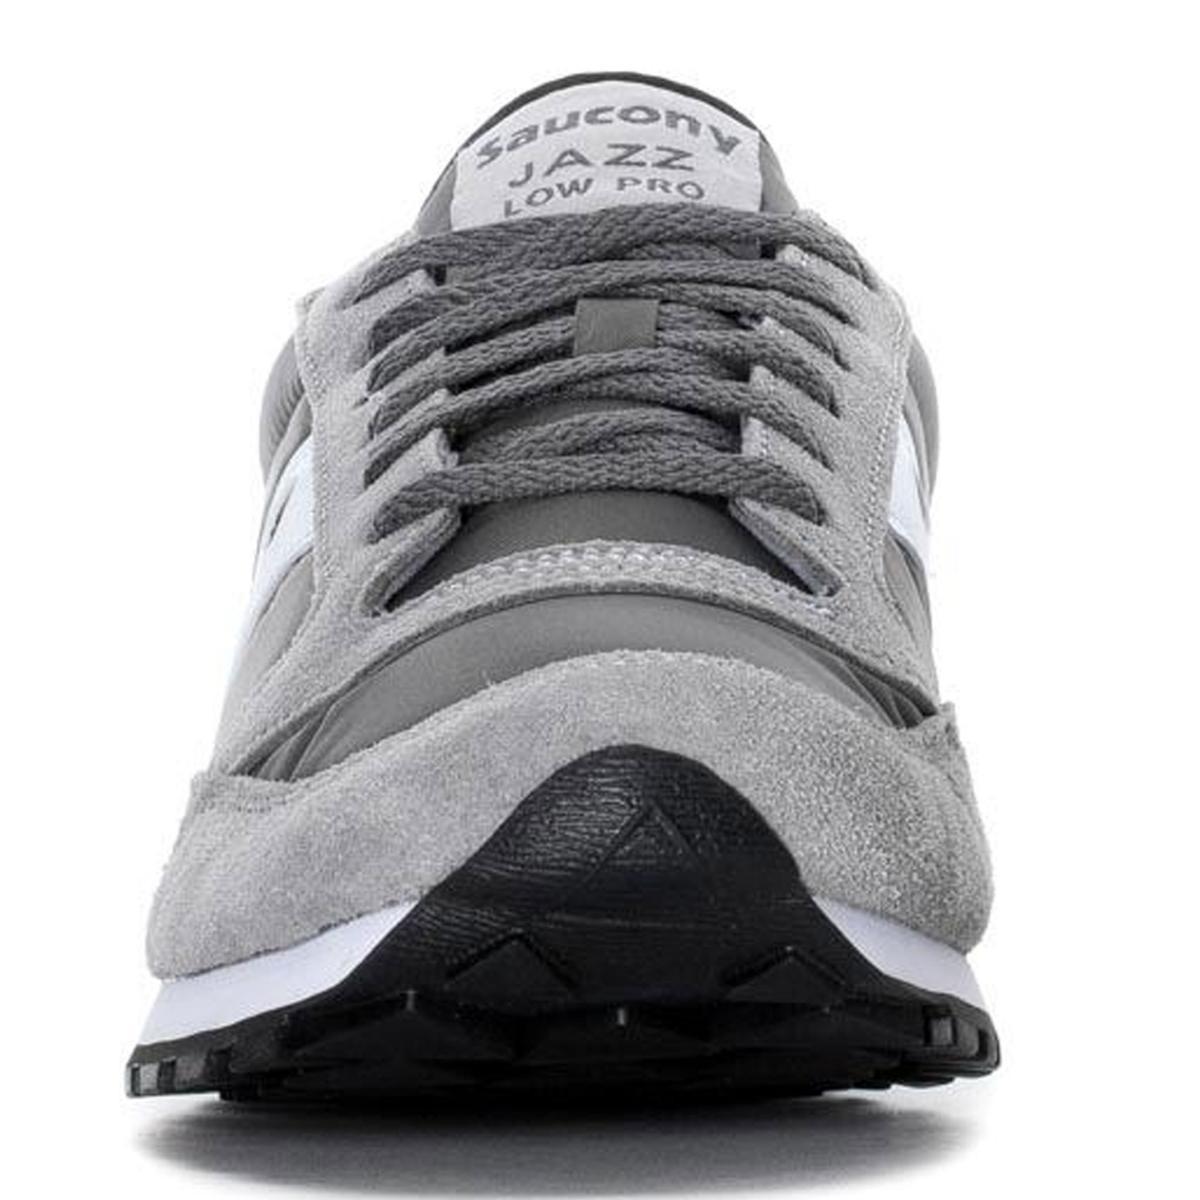 Scarpe Sneakers Saucony Jazz Low Pro Uomo rif. S2866-248